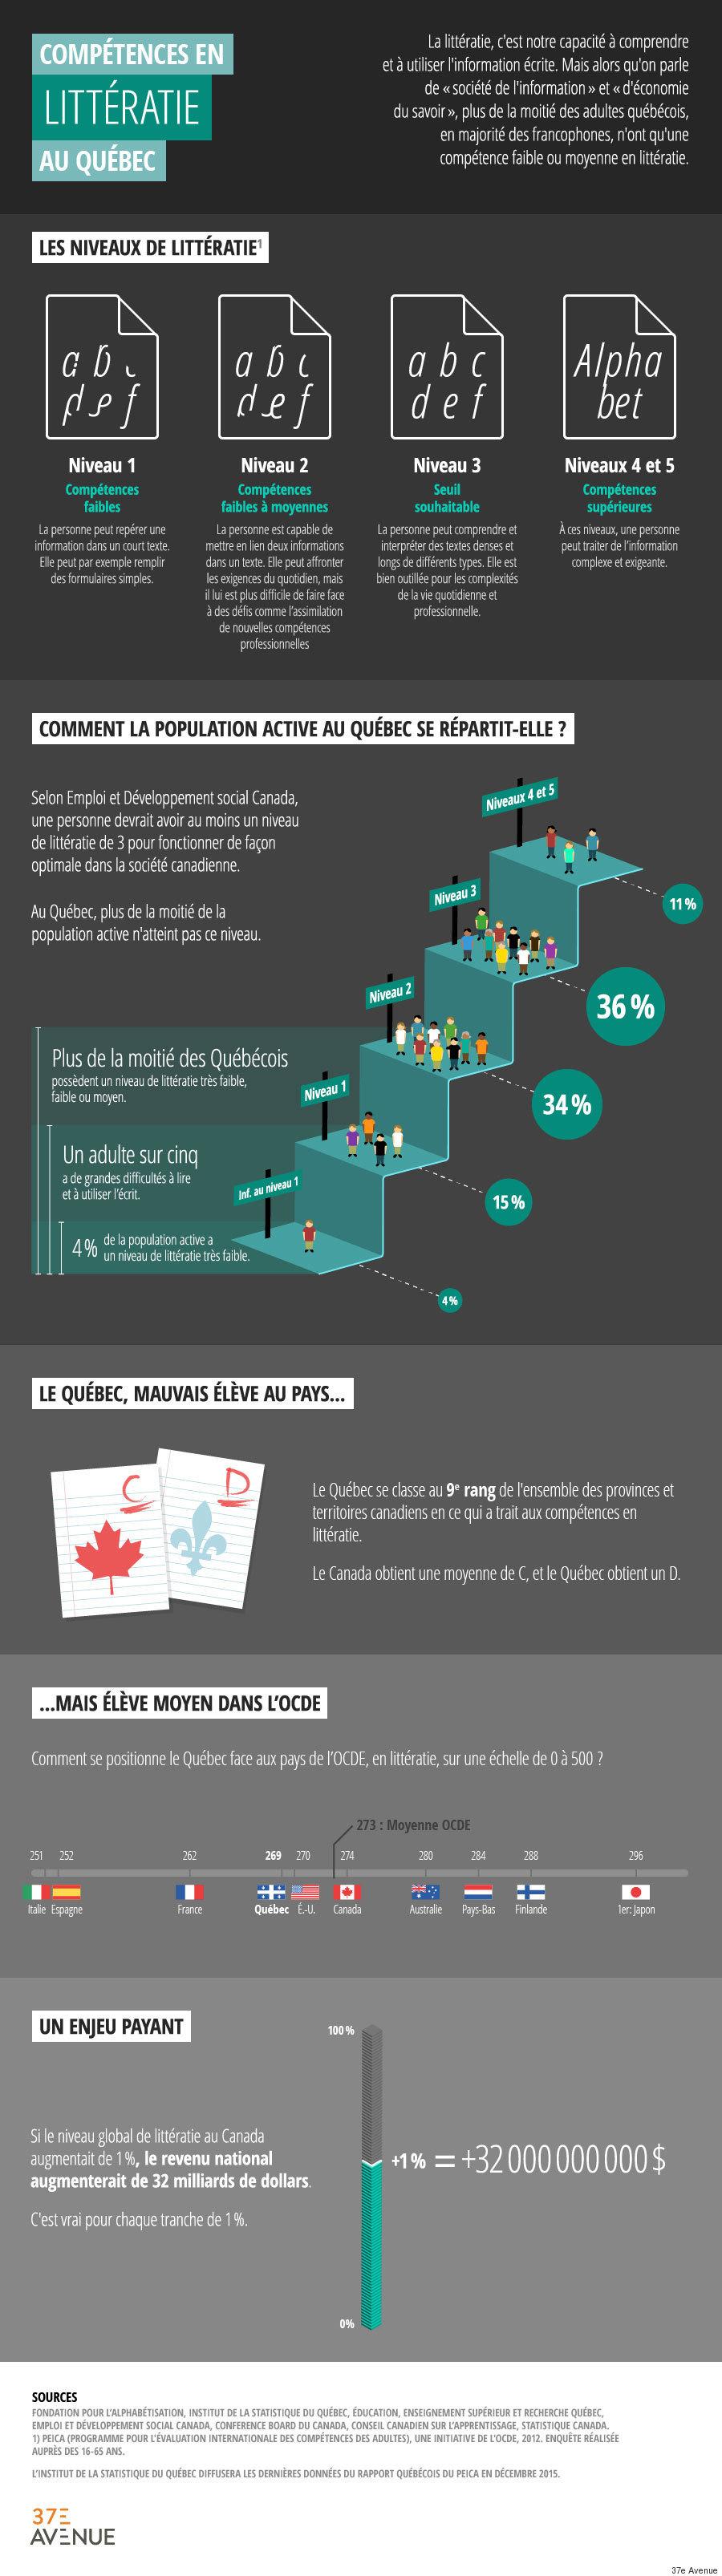 infographie analphabetisme